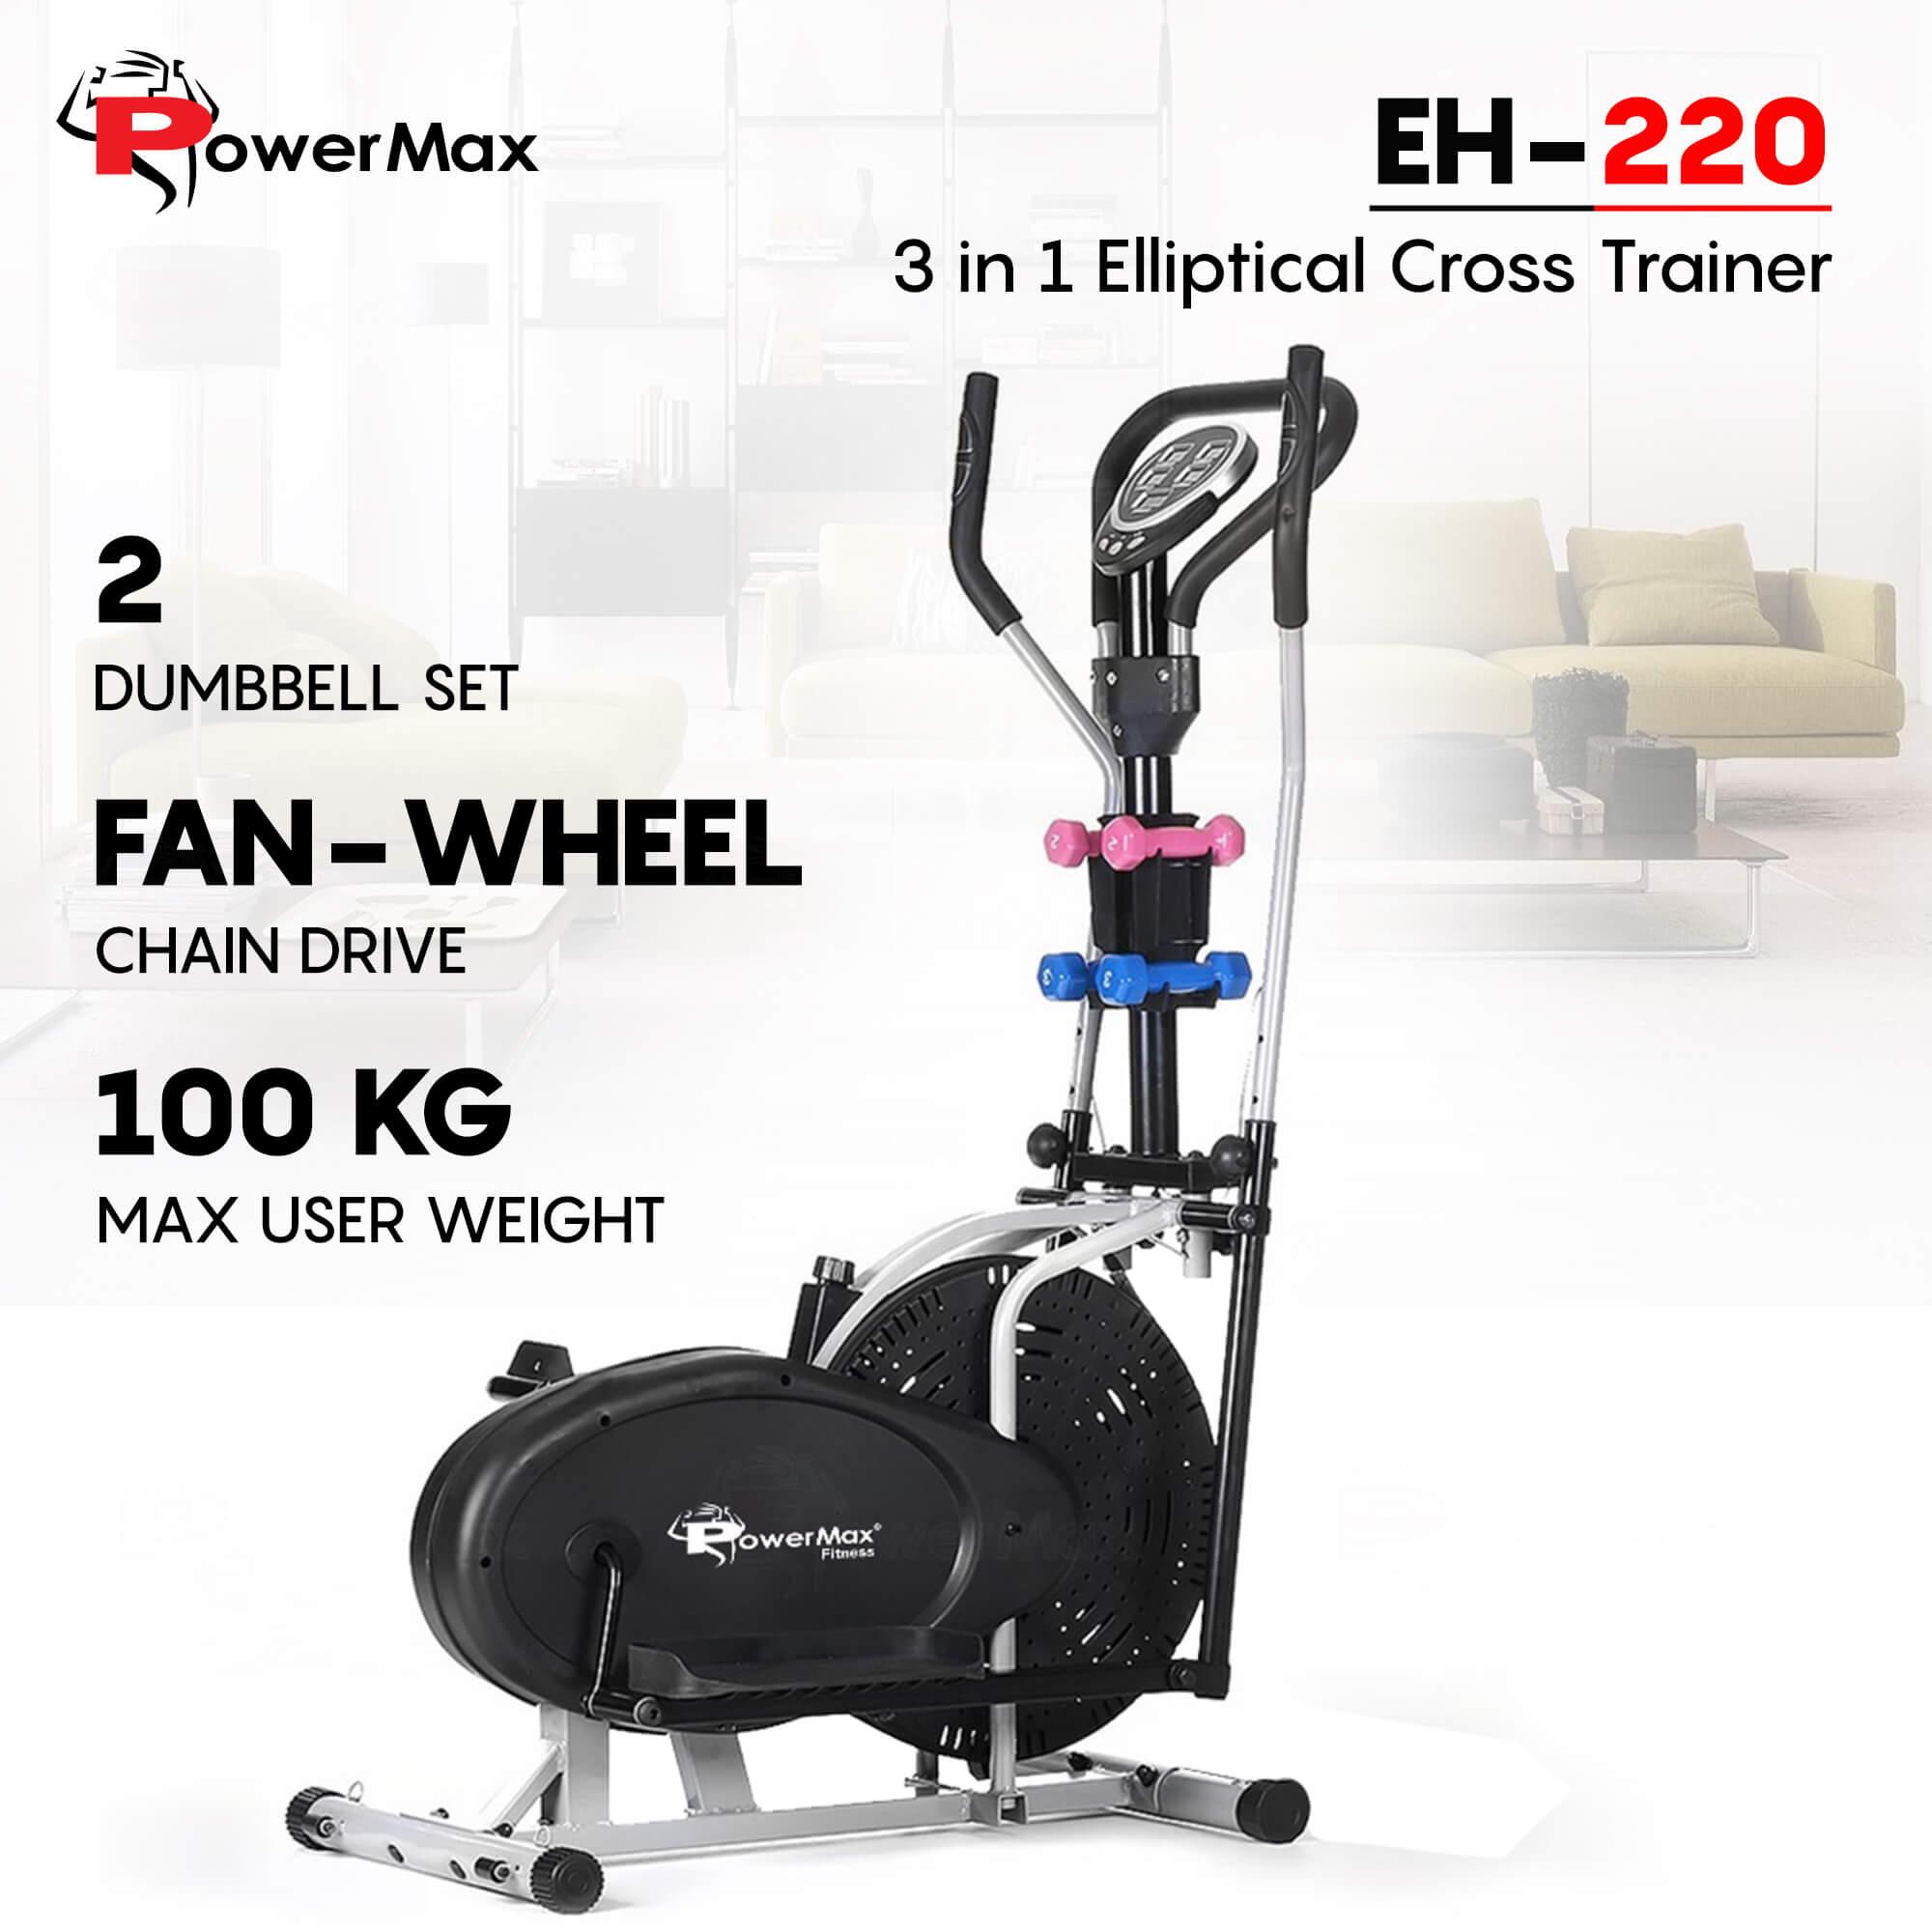 EH-220 3 in 1 Elliptical Cross Trainer